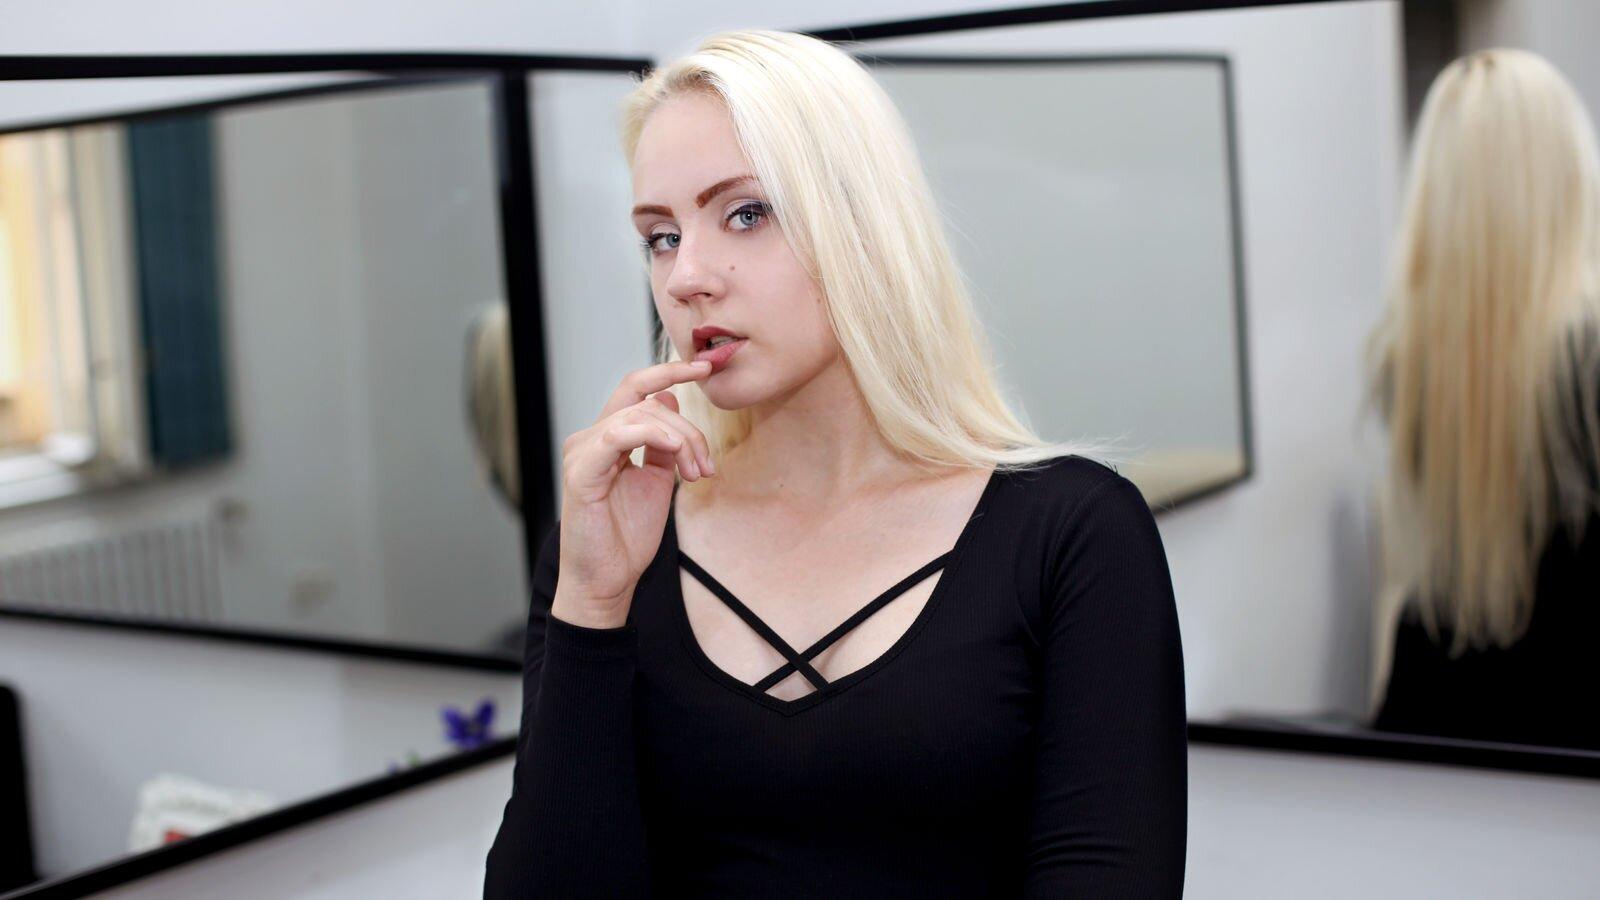 MeganRena